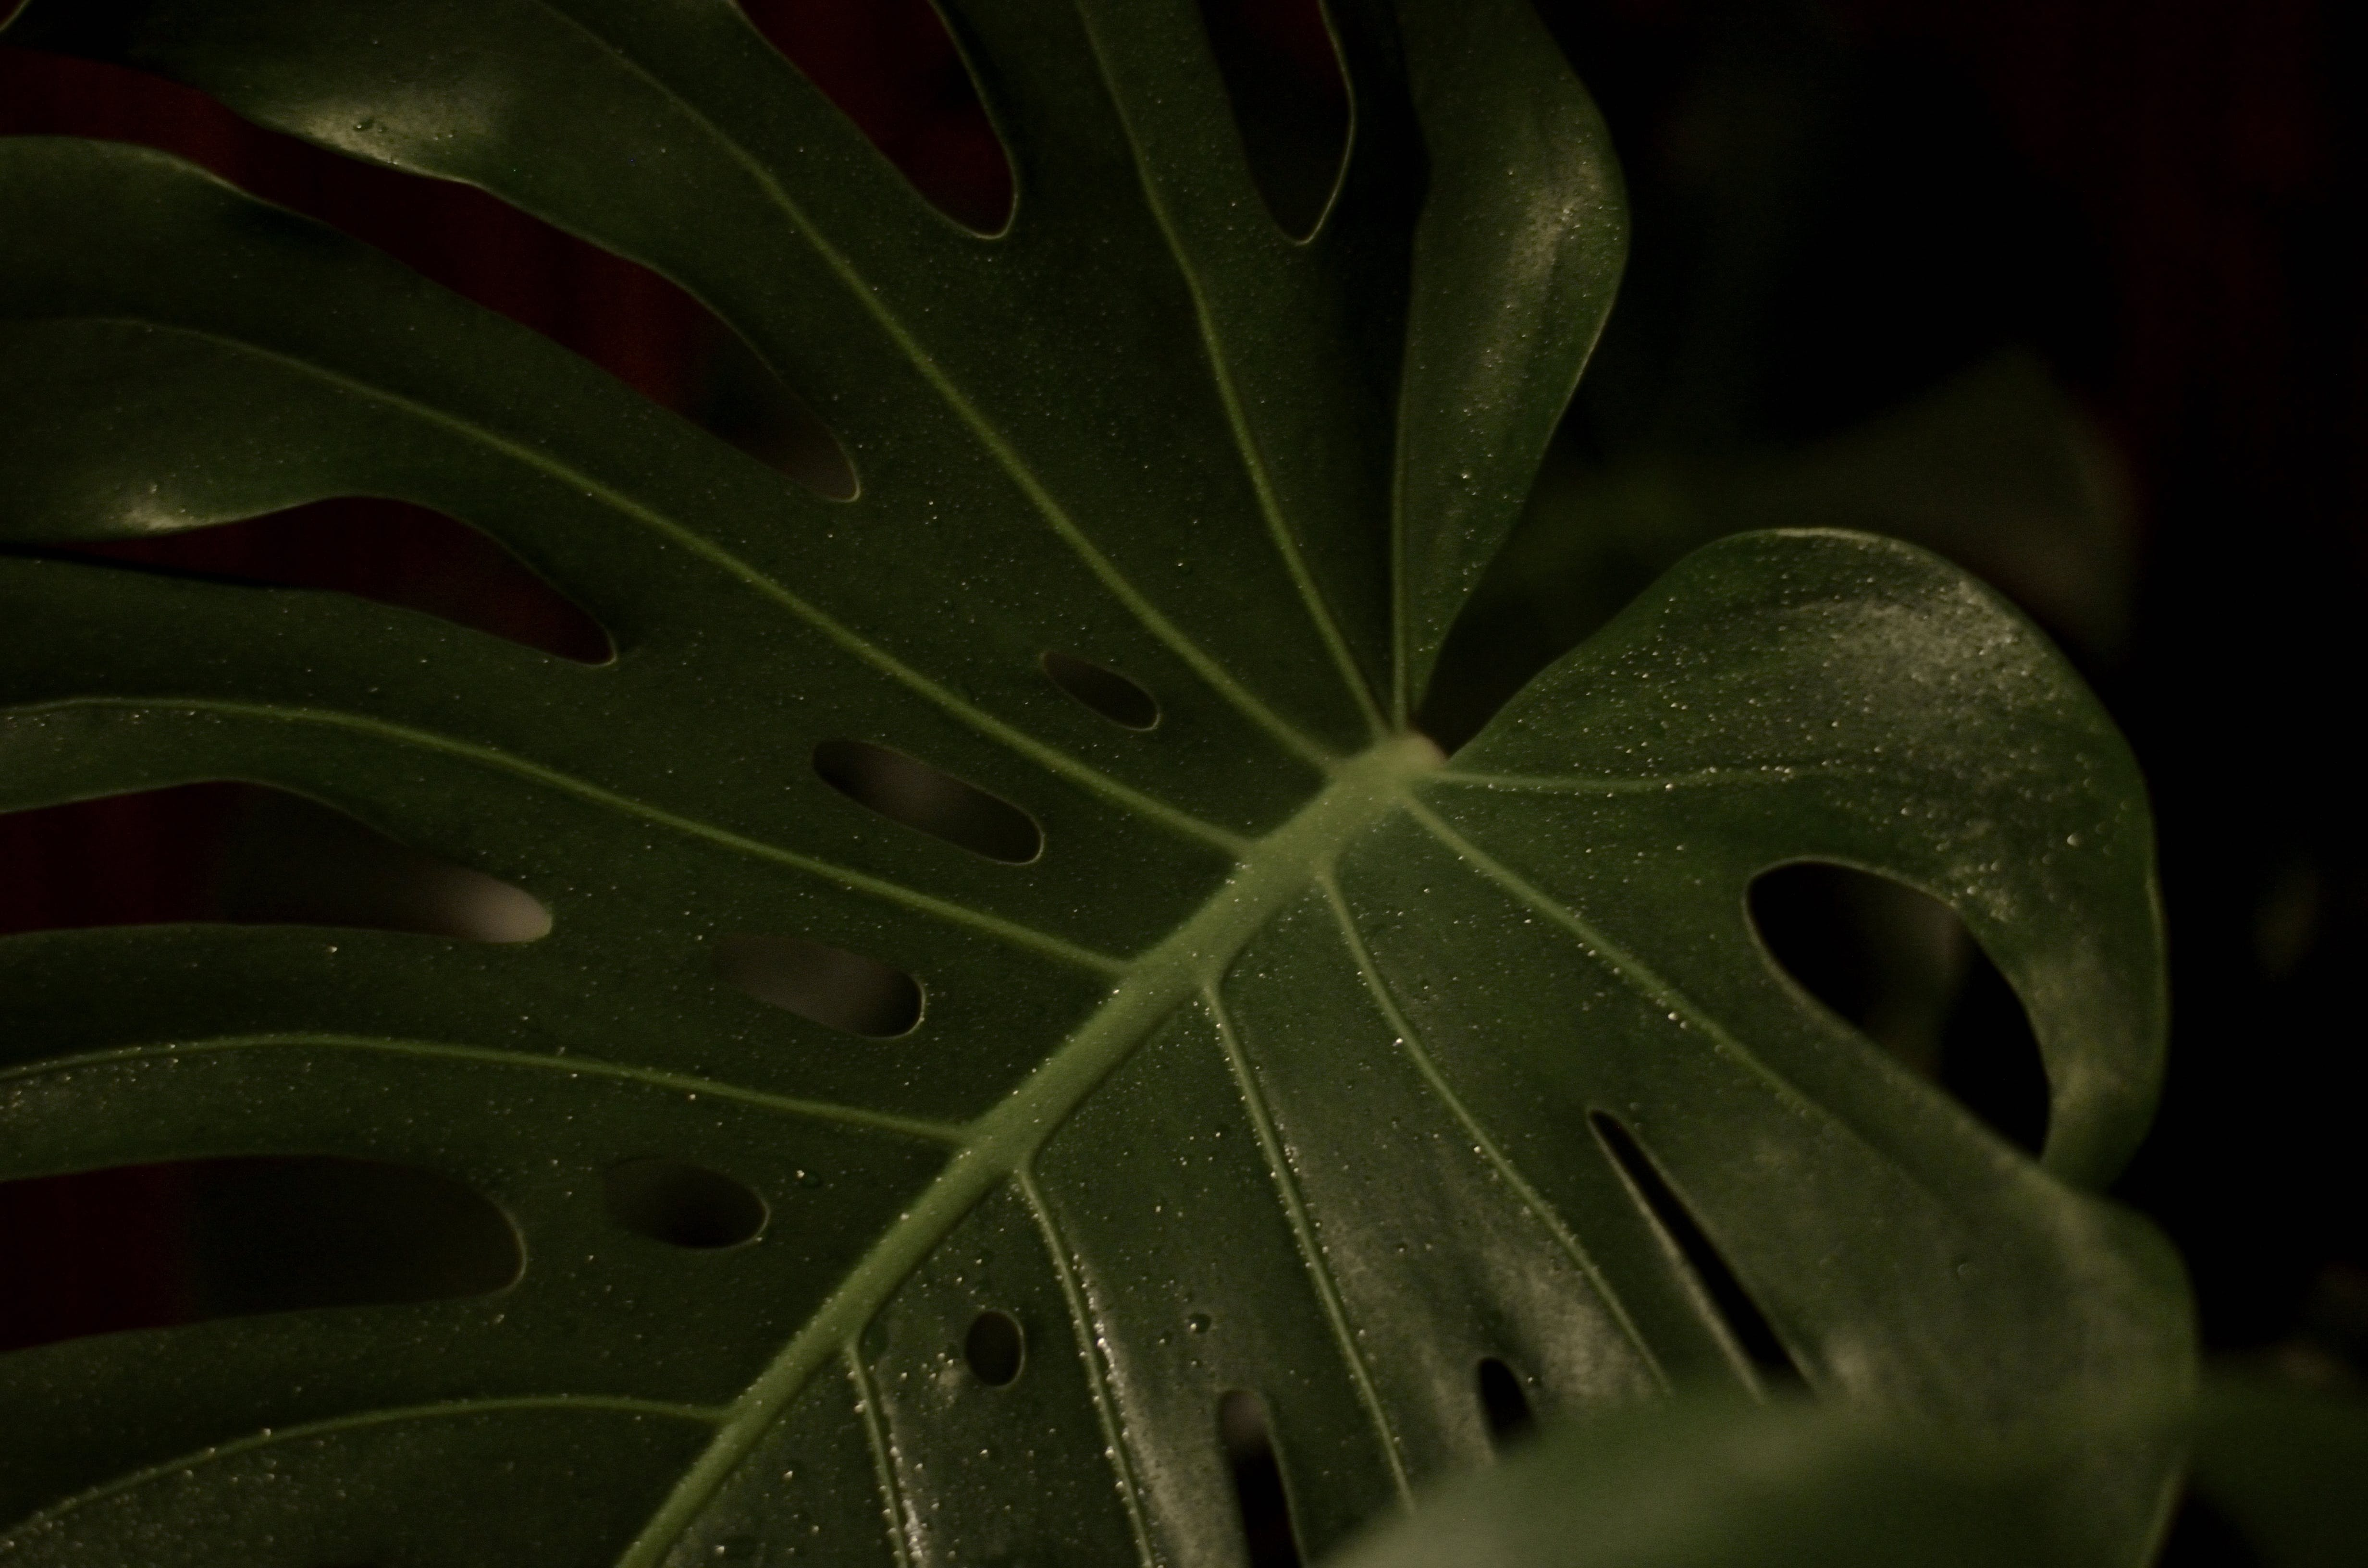 Closeup Photography of Green Heart Cut Leaf